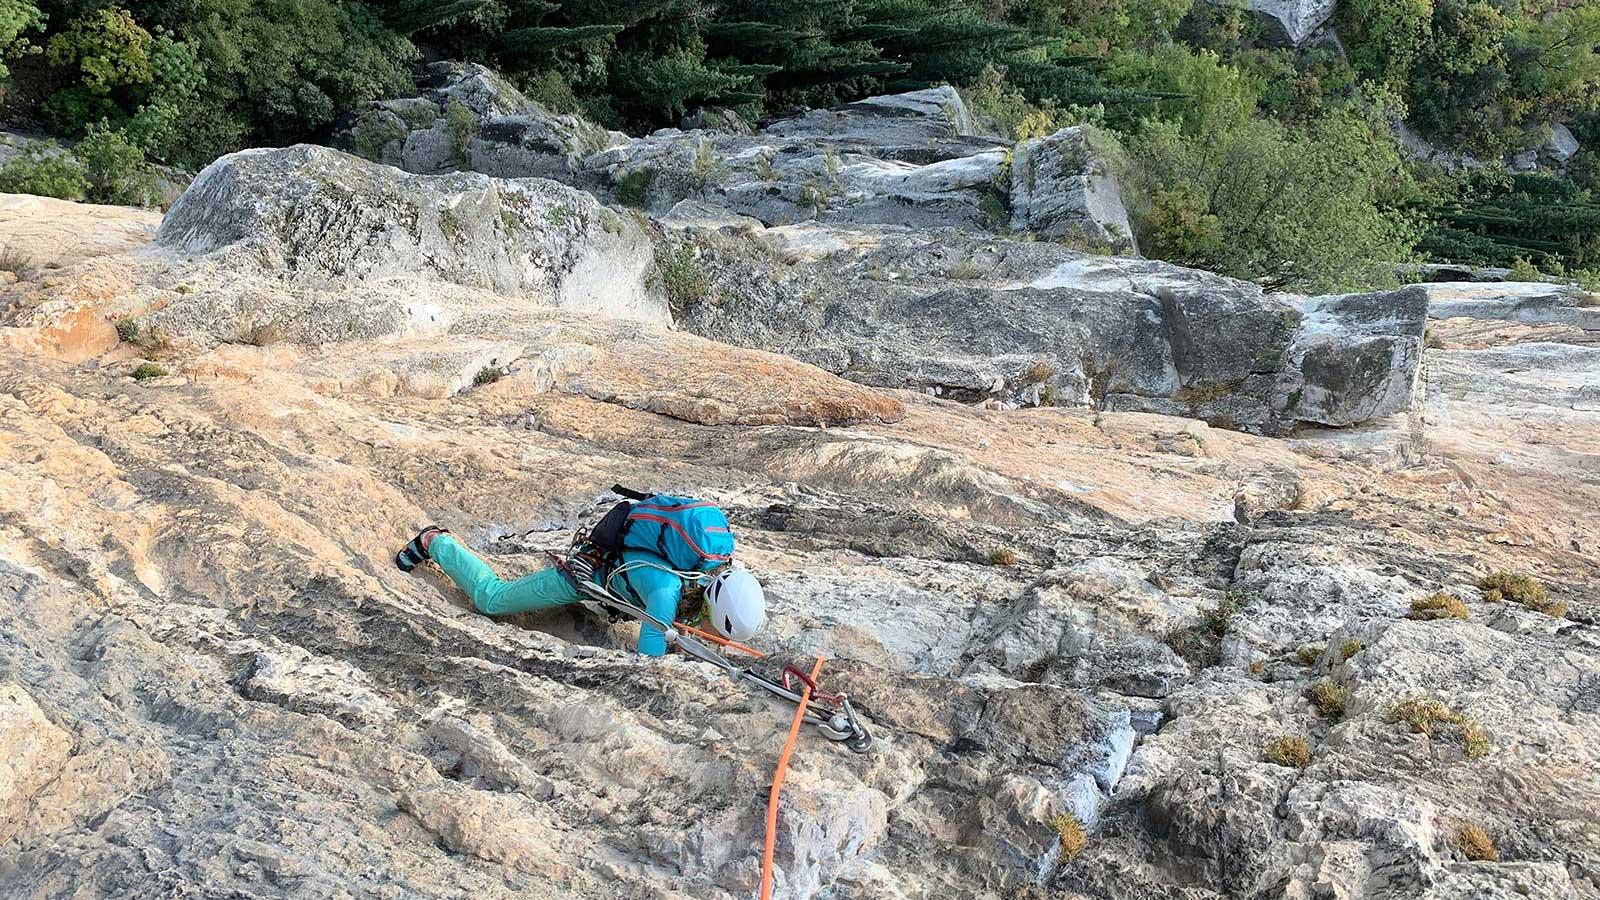 Klettern Bergführer I Alpine Kompetenz